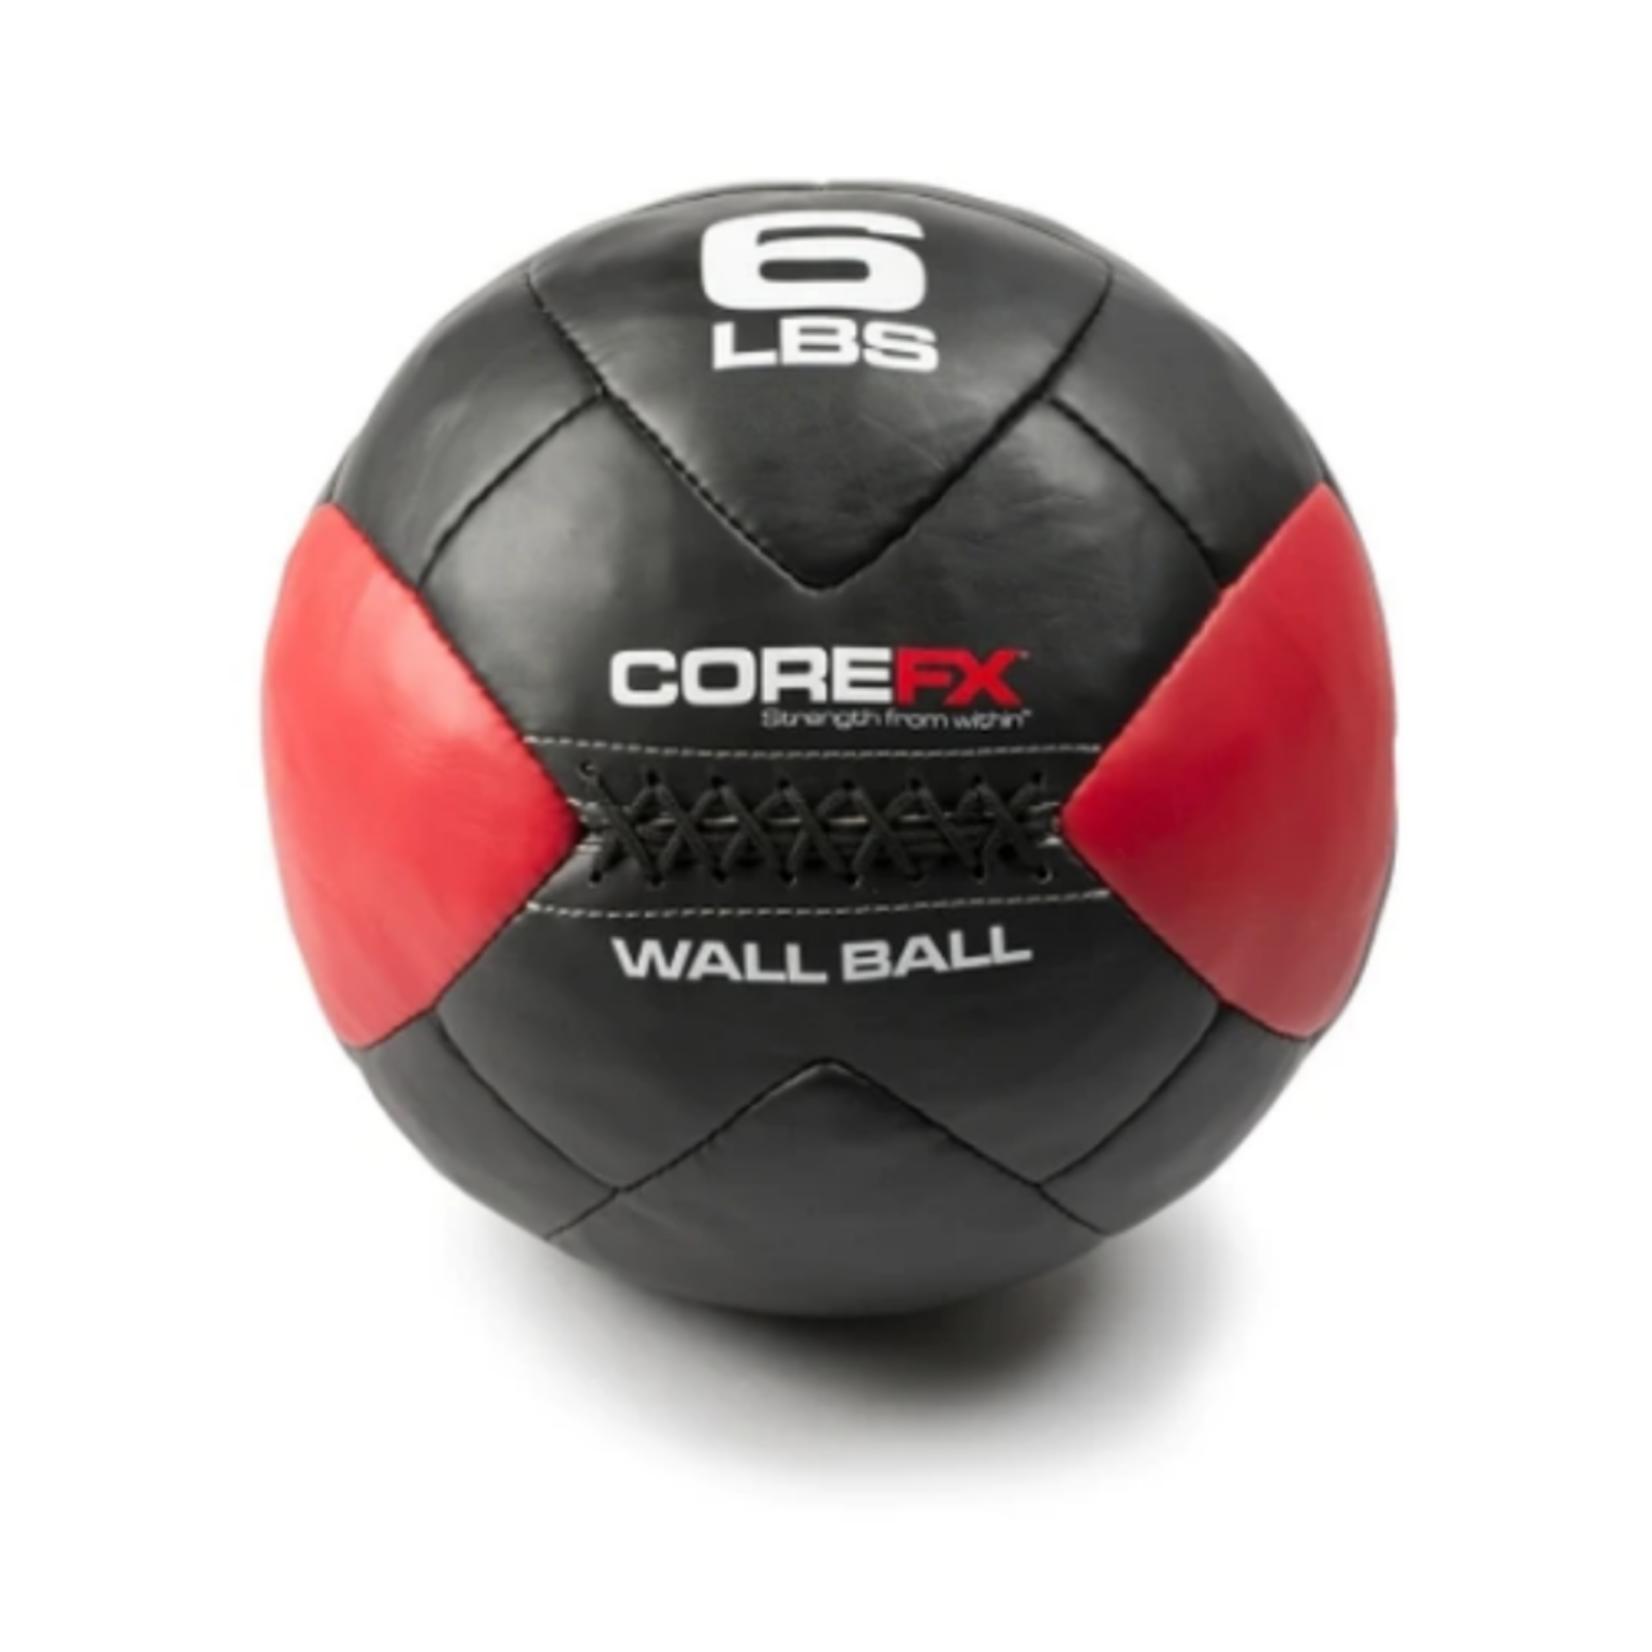 CoreFX Wall Ball - 6lbs (Medium)